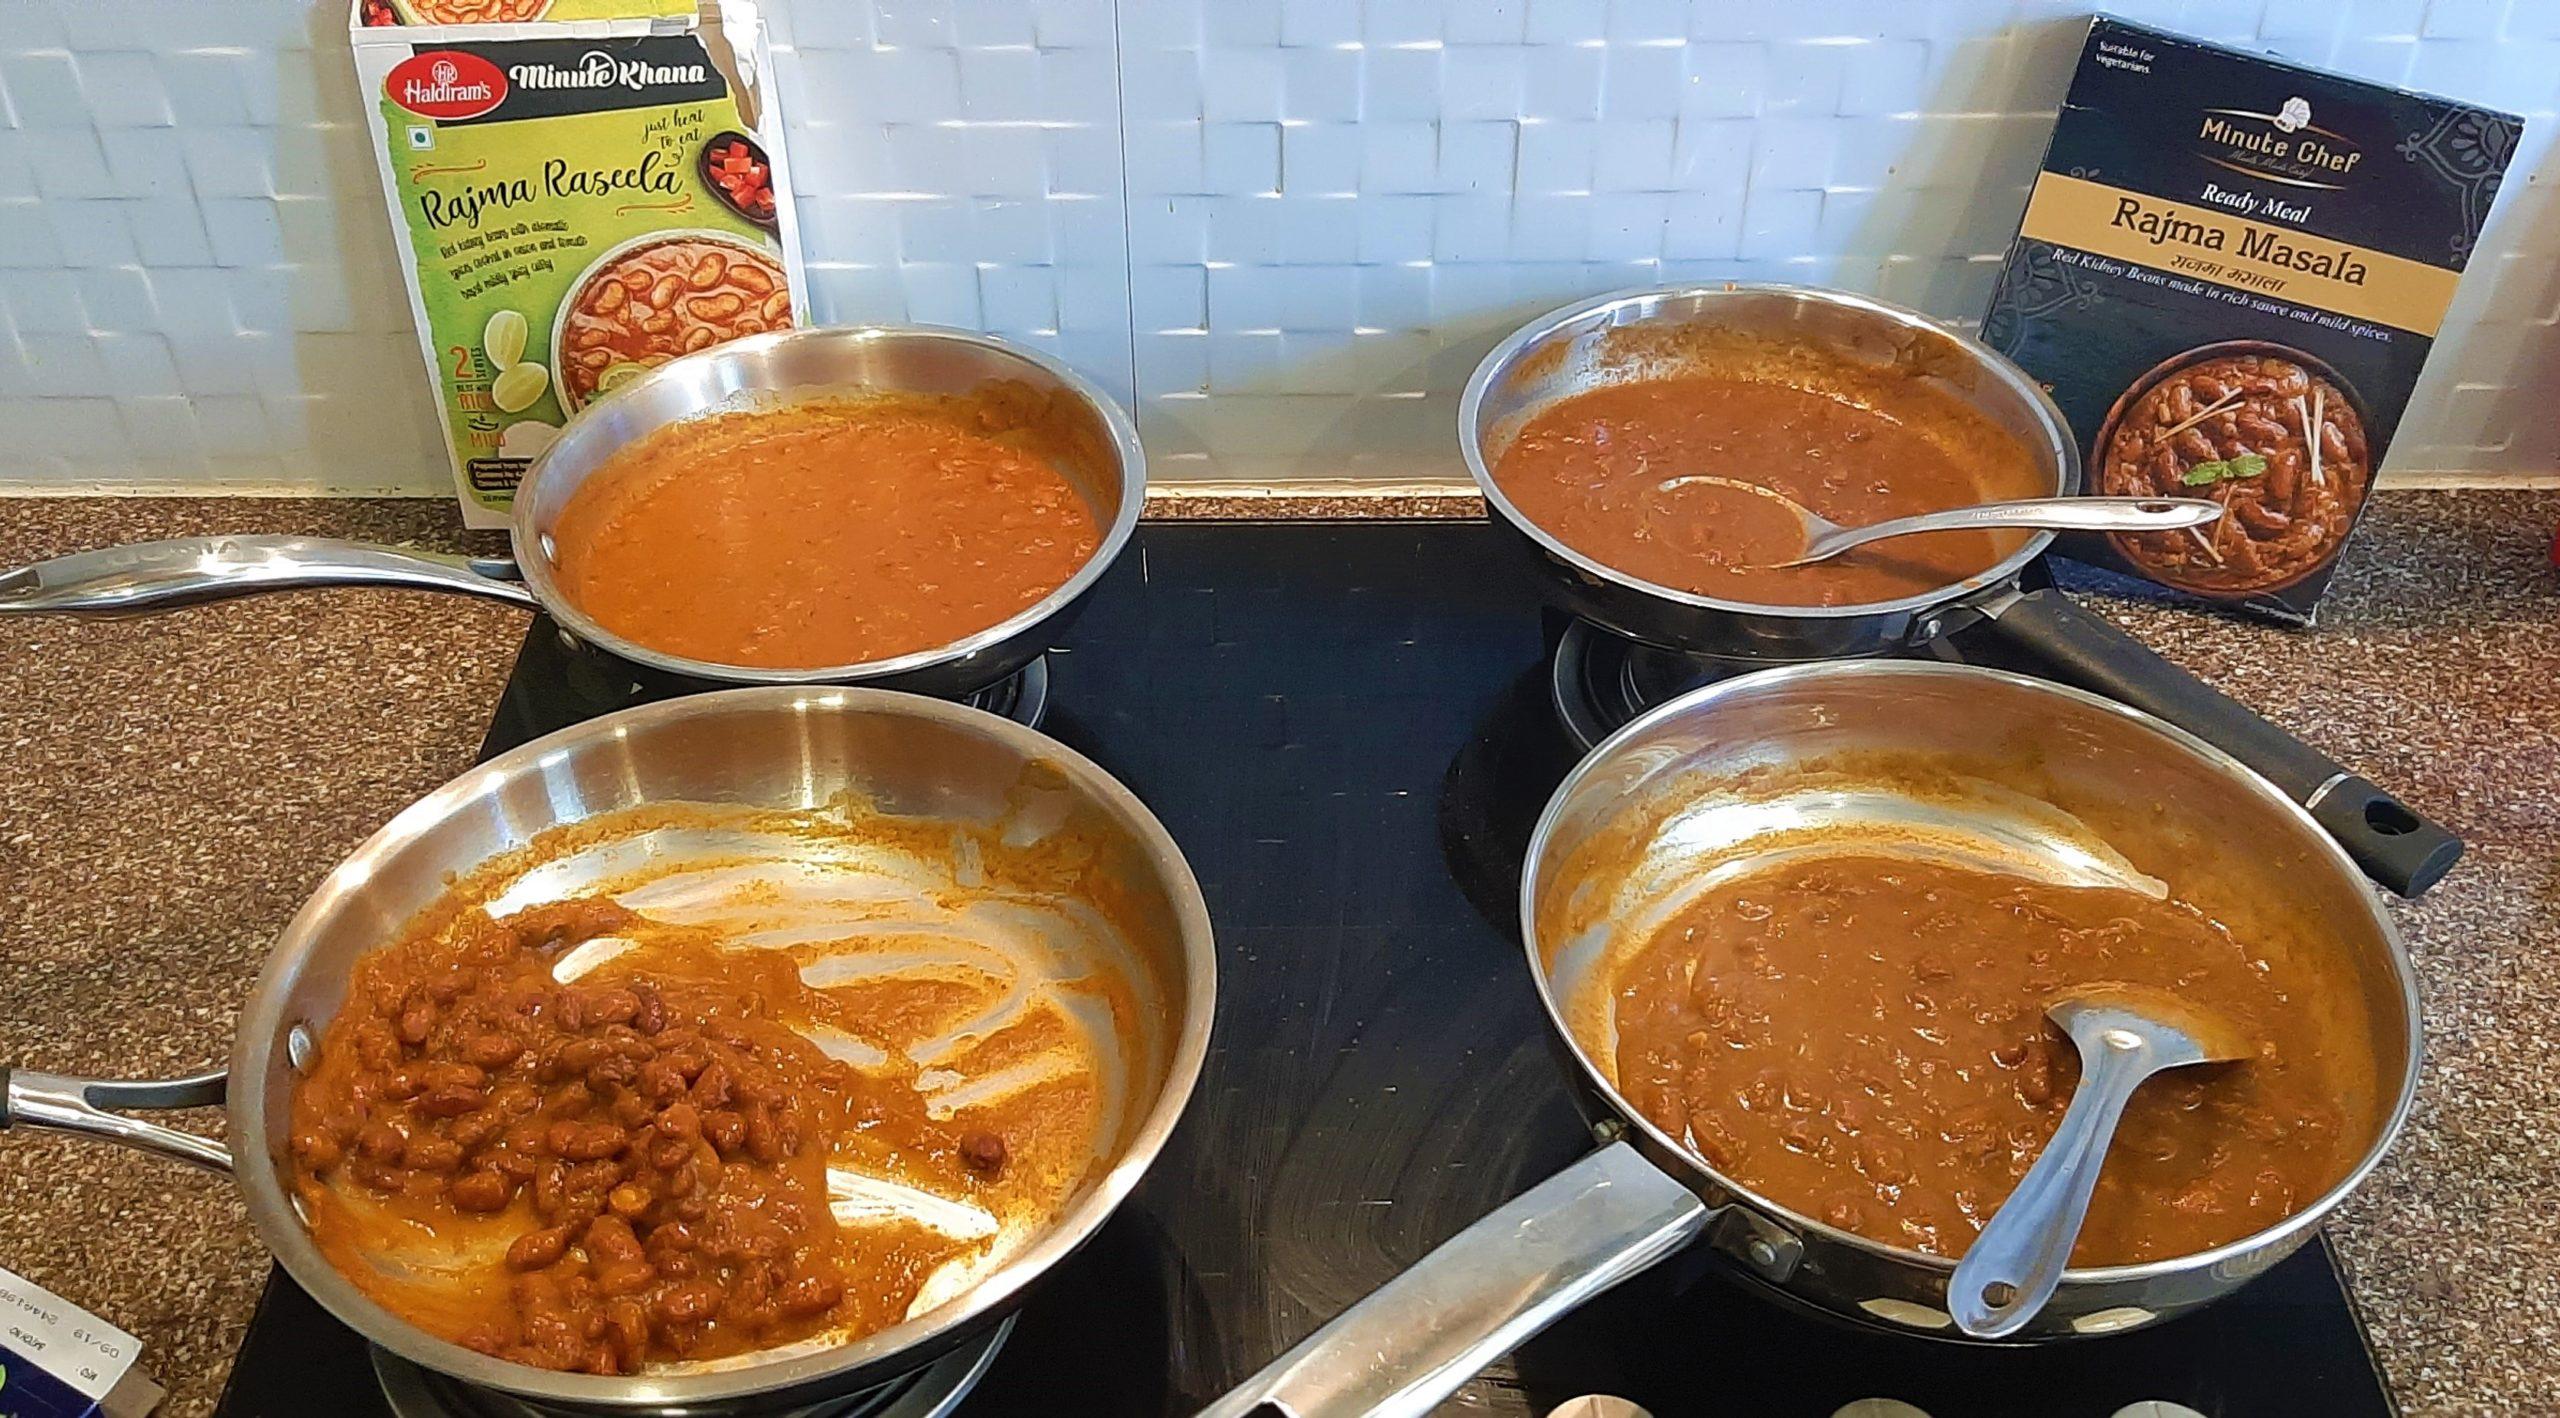 Tastiest Rajma Masala (Ready To Eat) – Mishry Reviews